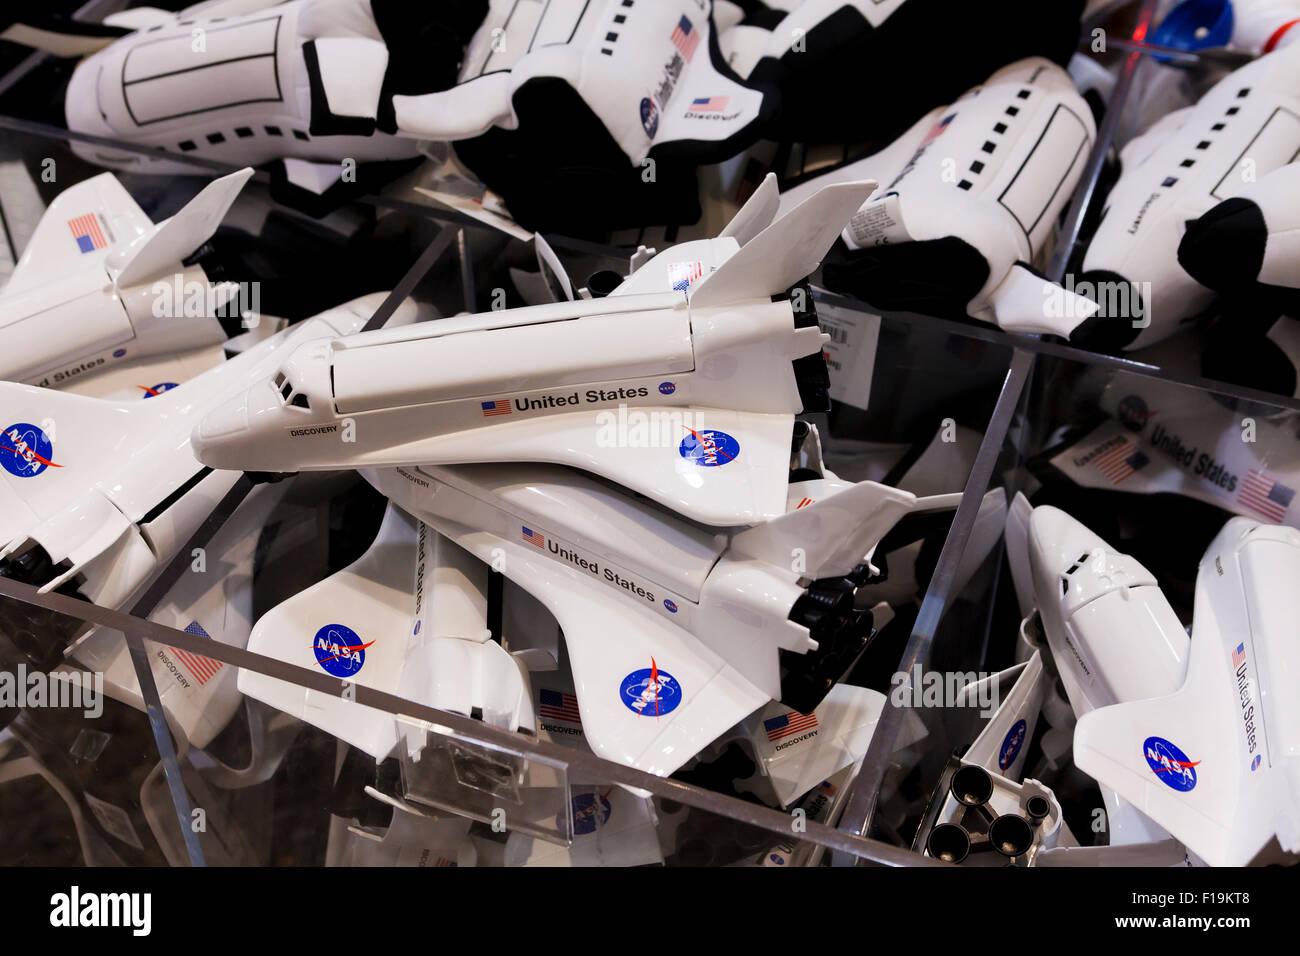 NASA Space Shuttle toys - USA - Stock Image